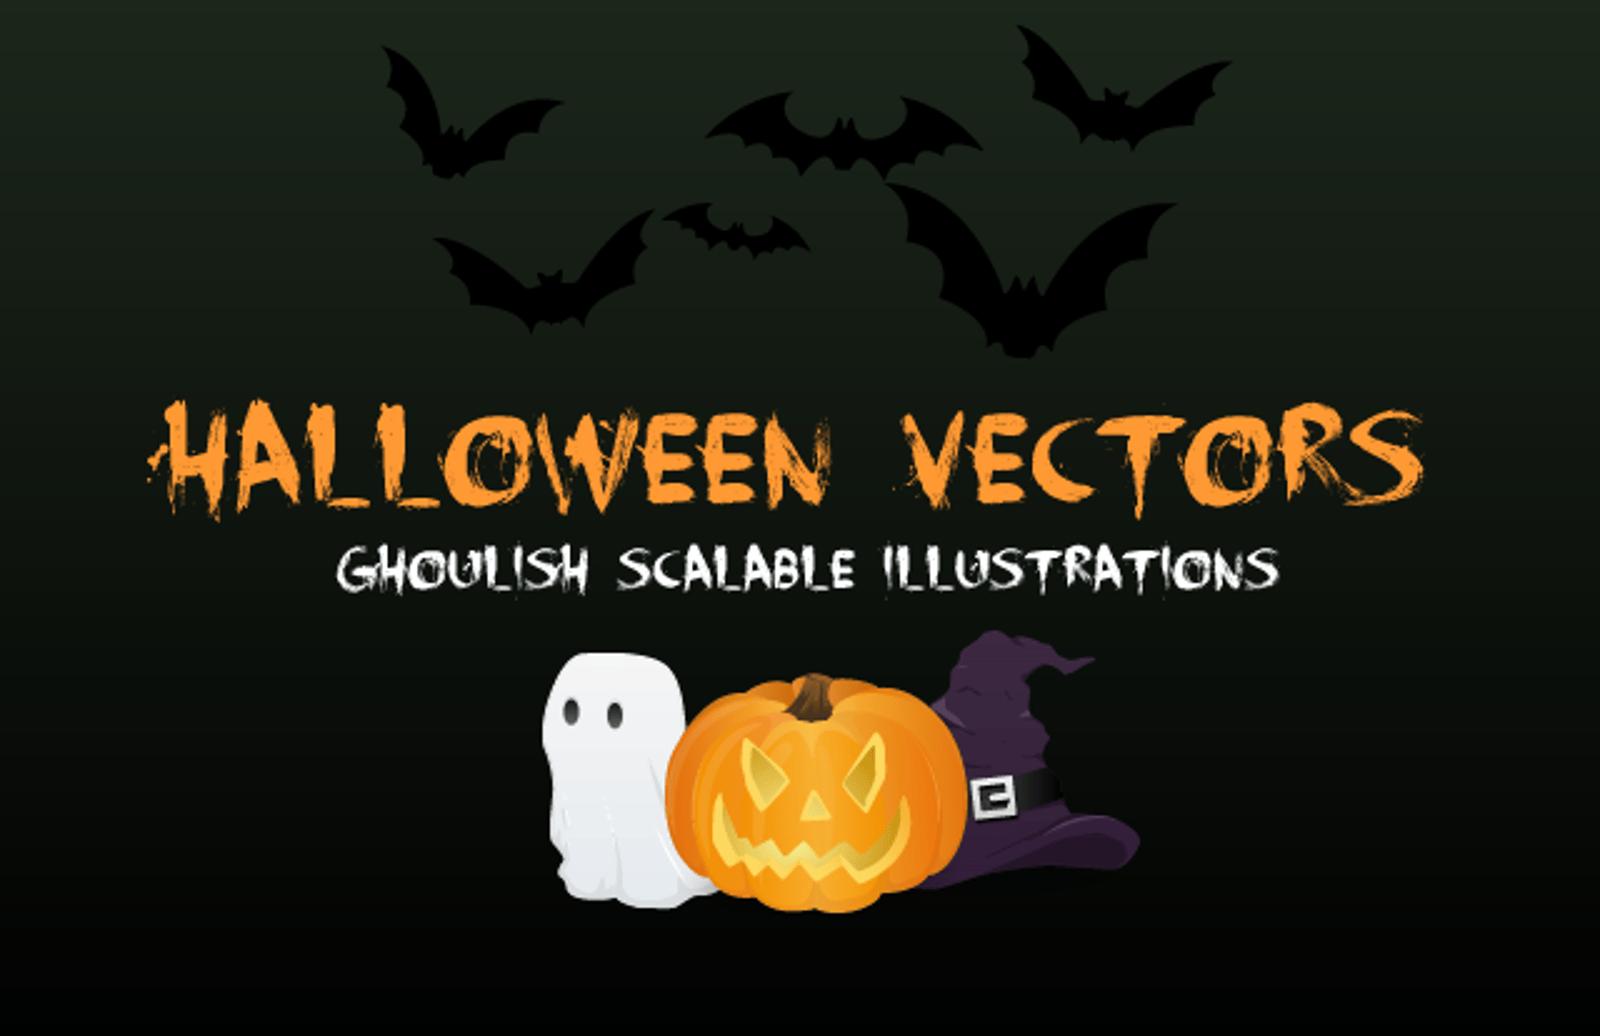 Ghoulish  Halloween  Vectors  Preview1